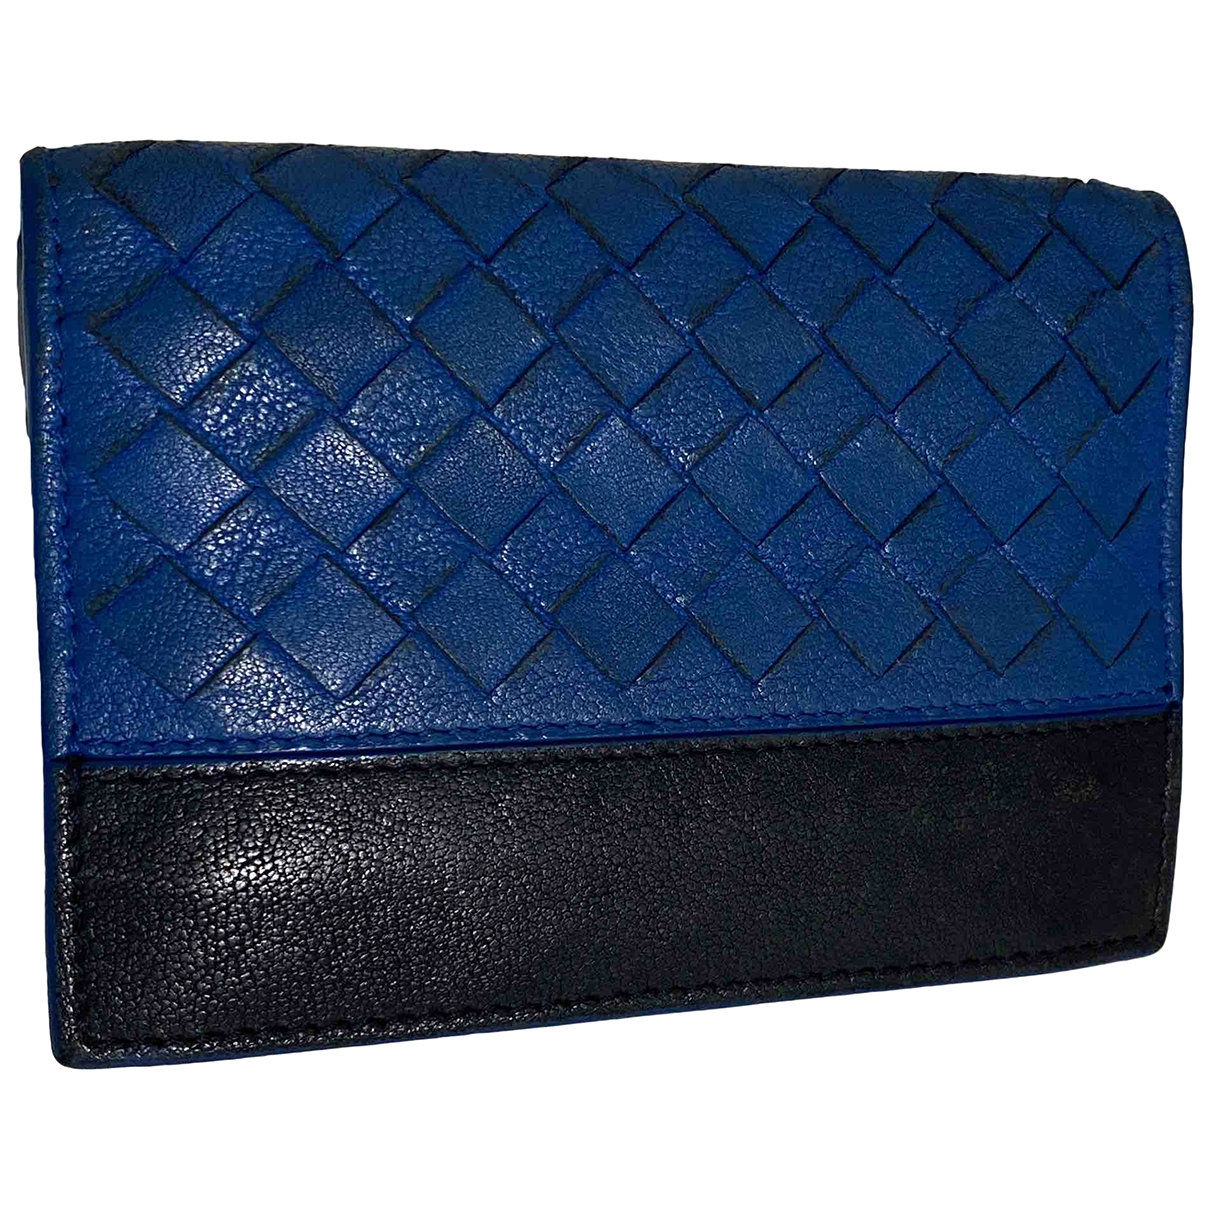 Bottega Veneta - Petite maroquinerie Intrecciato pour femme en cuir - bleu